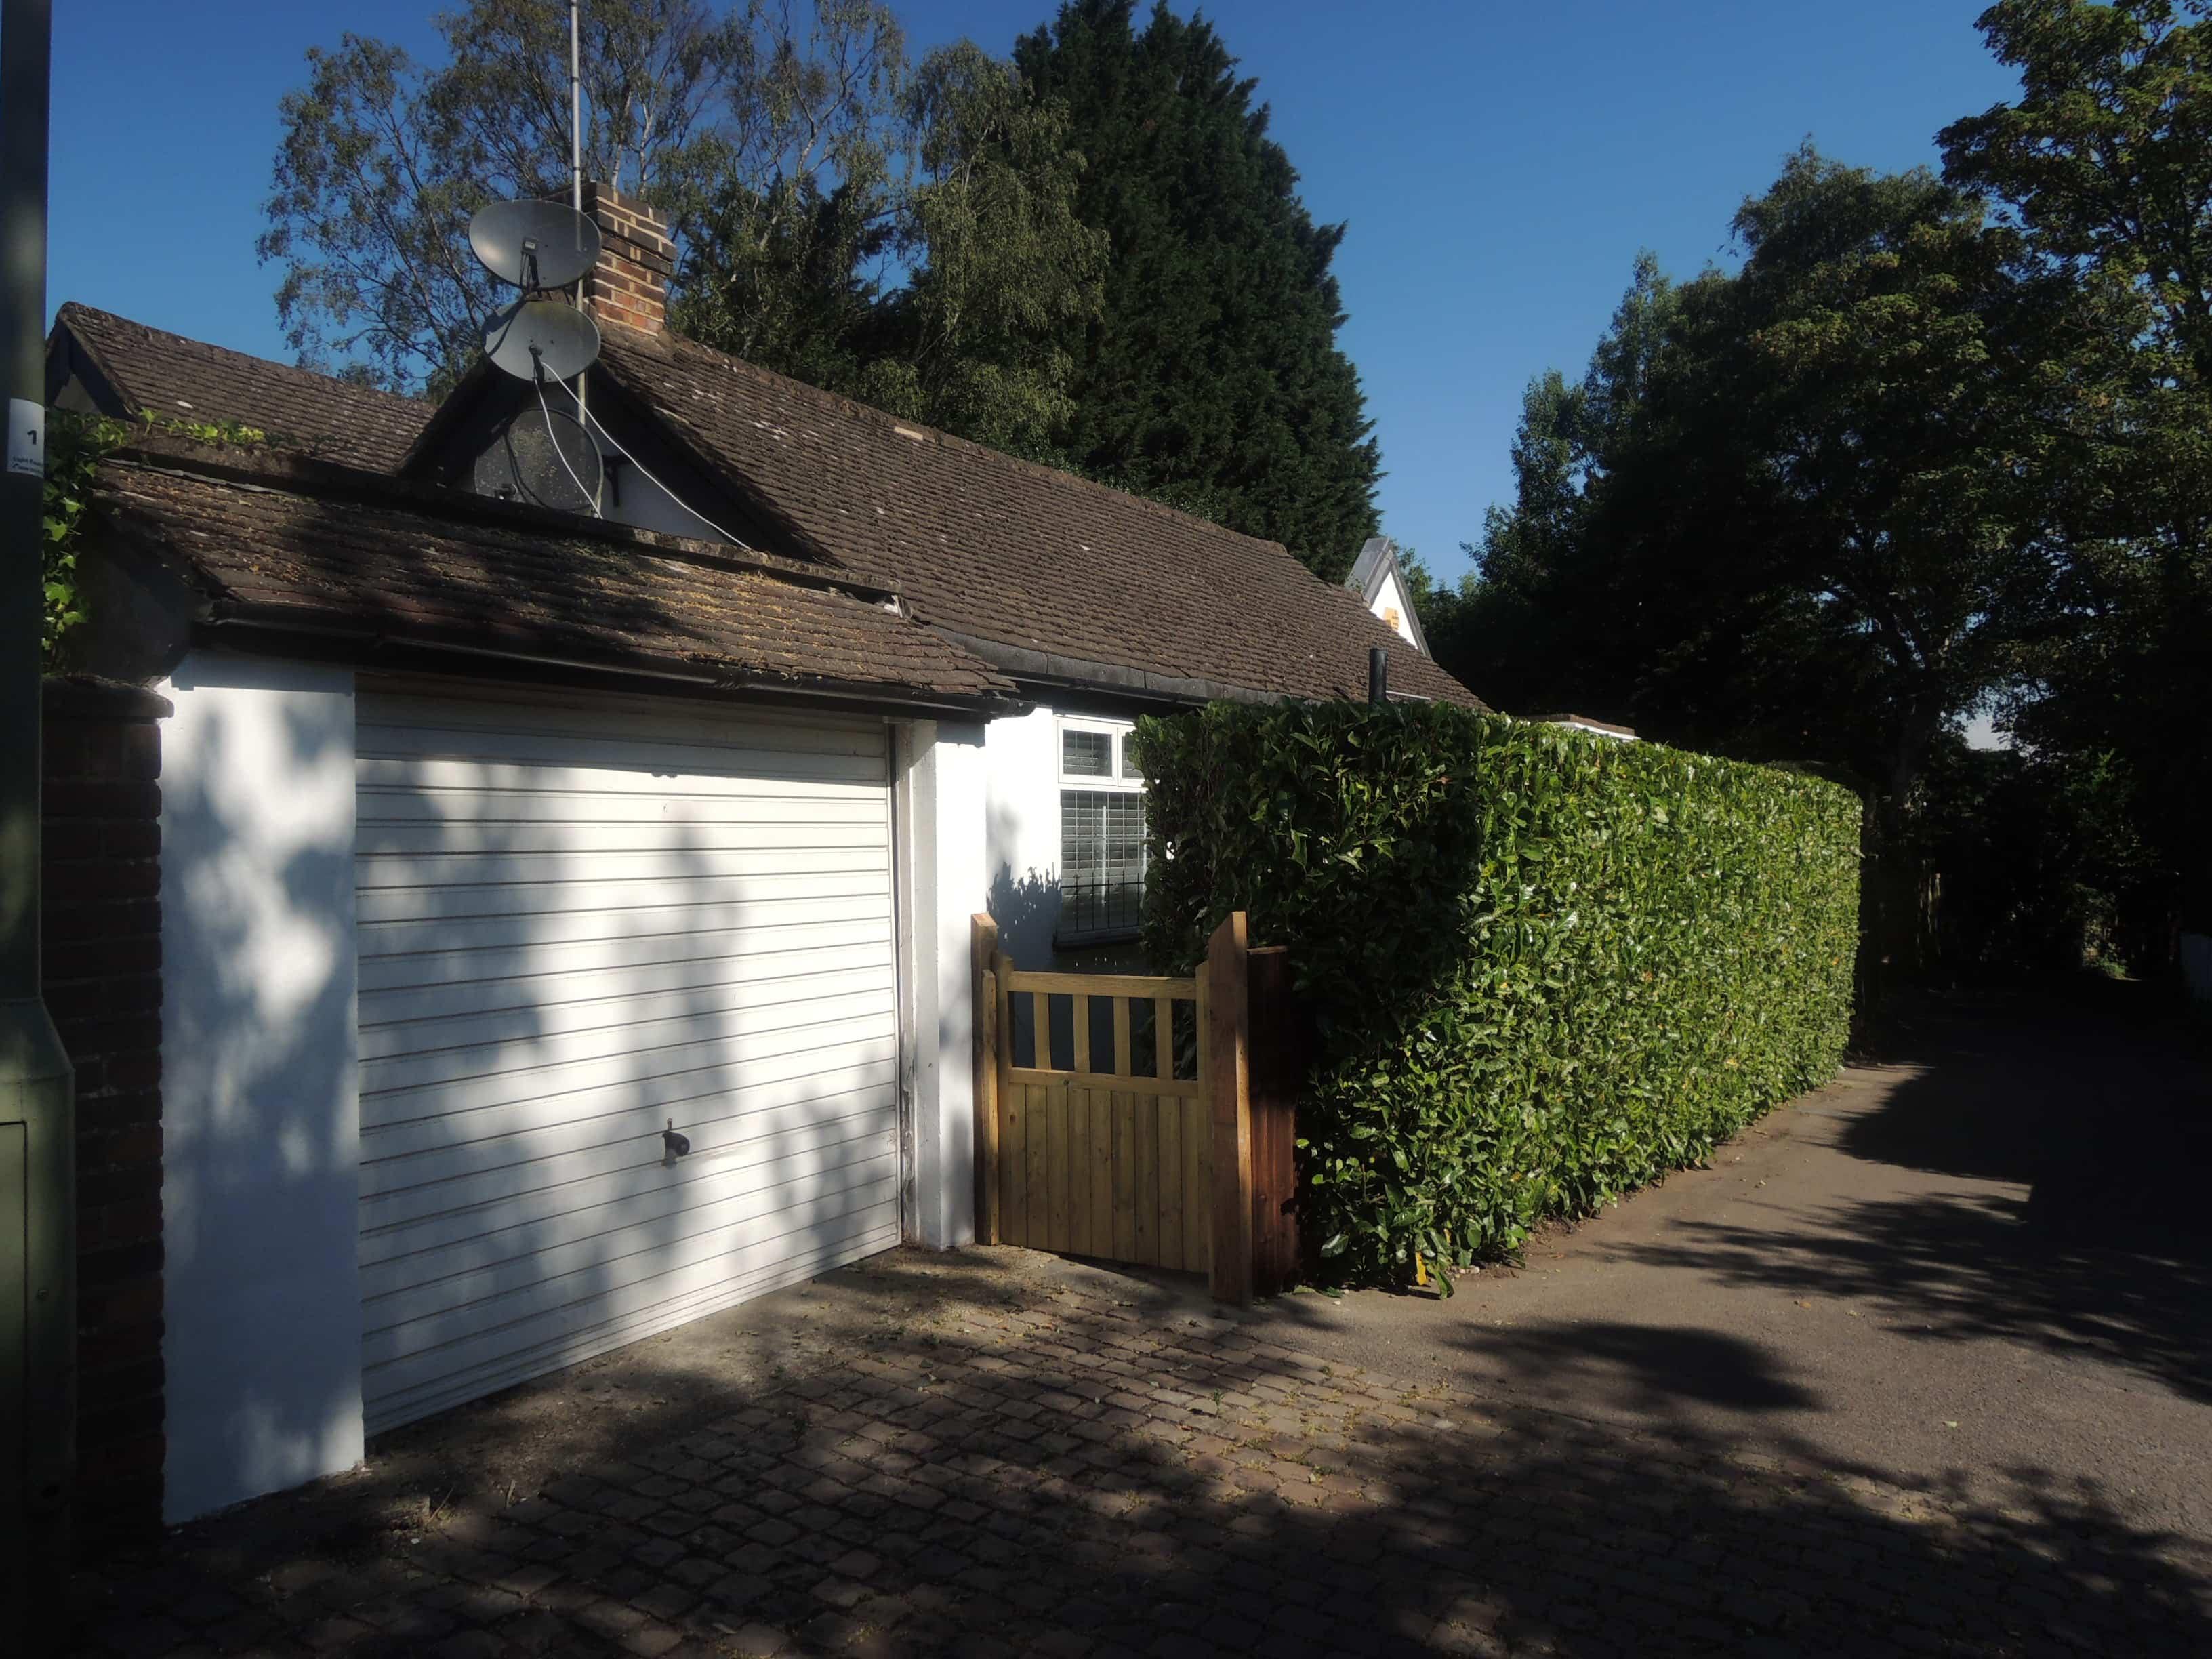 Totteridge N20 (Lime Grove)